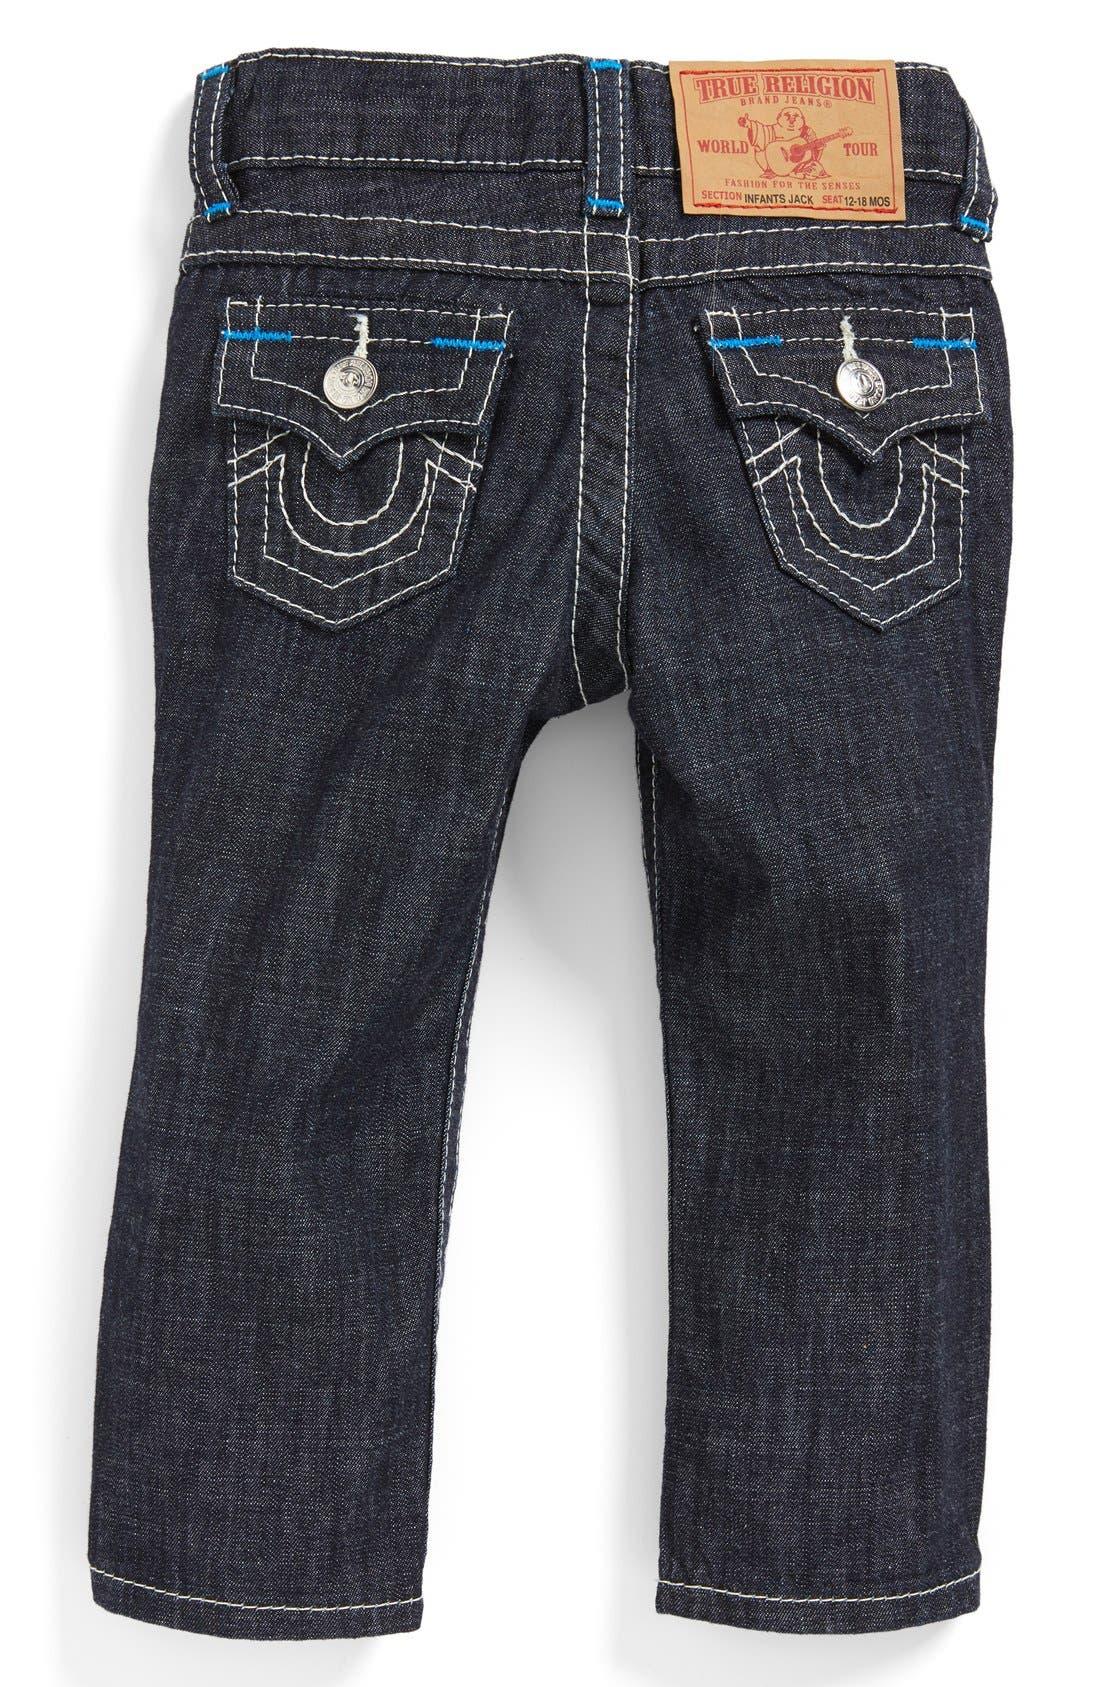 Main Image - True Religion Brand Jeans 'Jack' Slim Fit Jeans (Baby Boys)